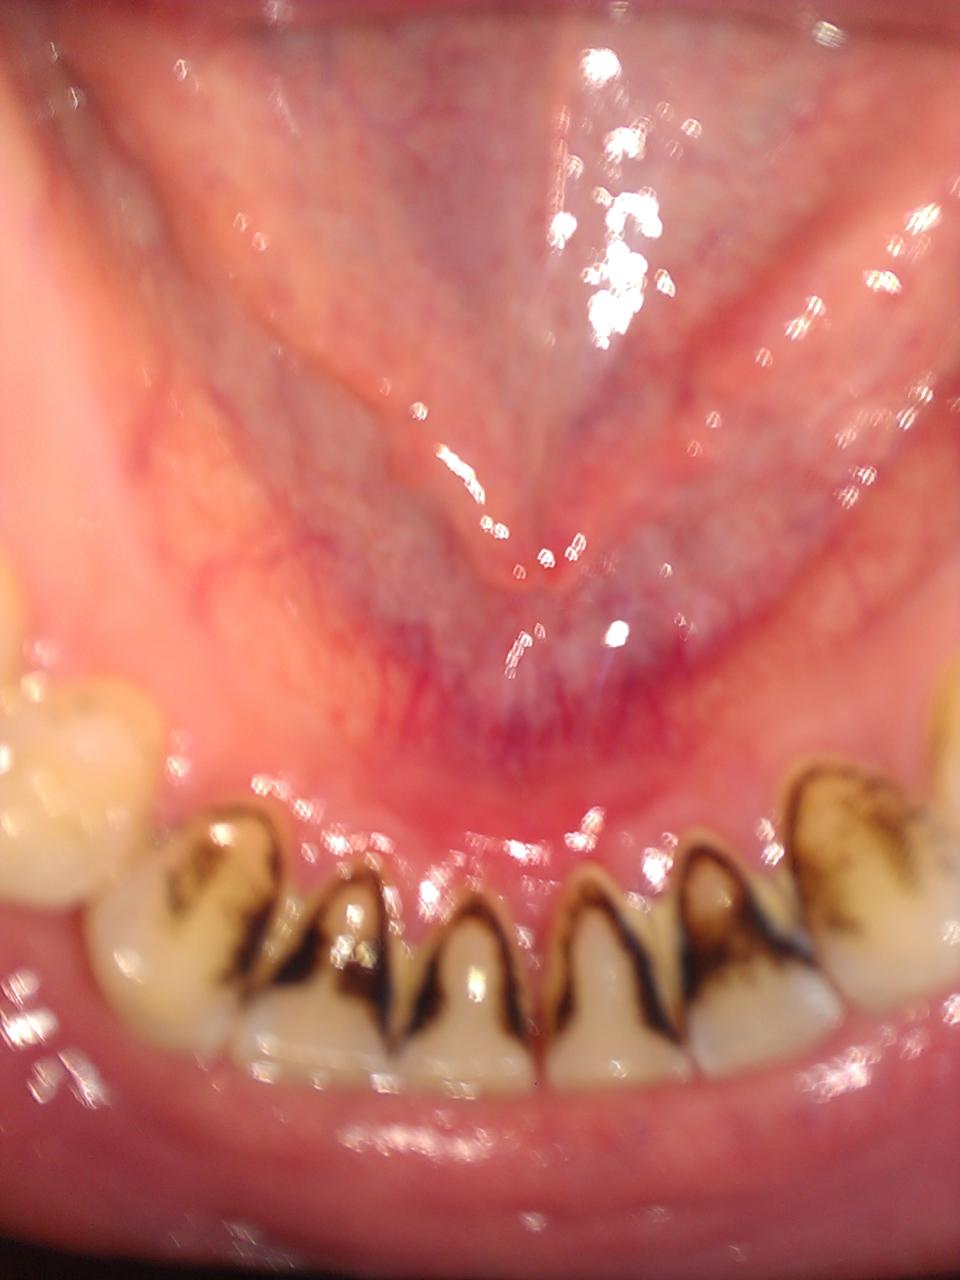 Schwarze Stellen Am Zahn Selber Entfernen